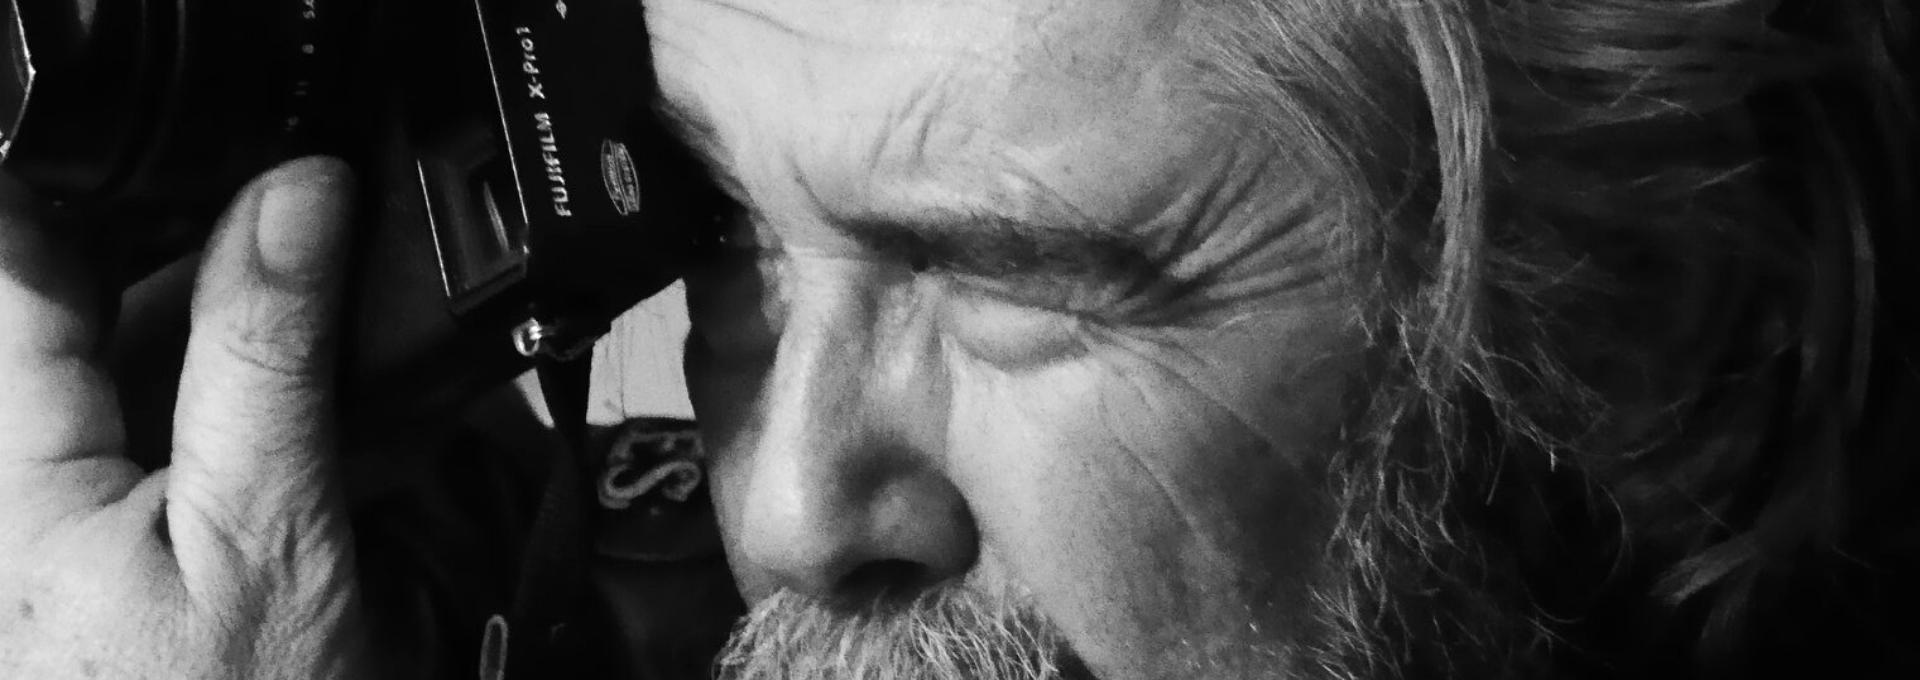 Rencontre avec Reynald Reyland, photographe au Brin de Zinc